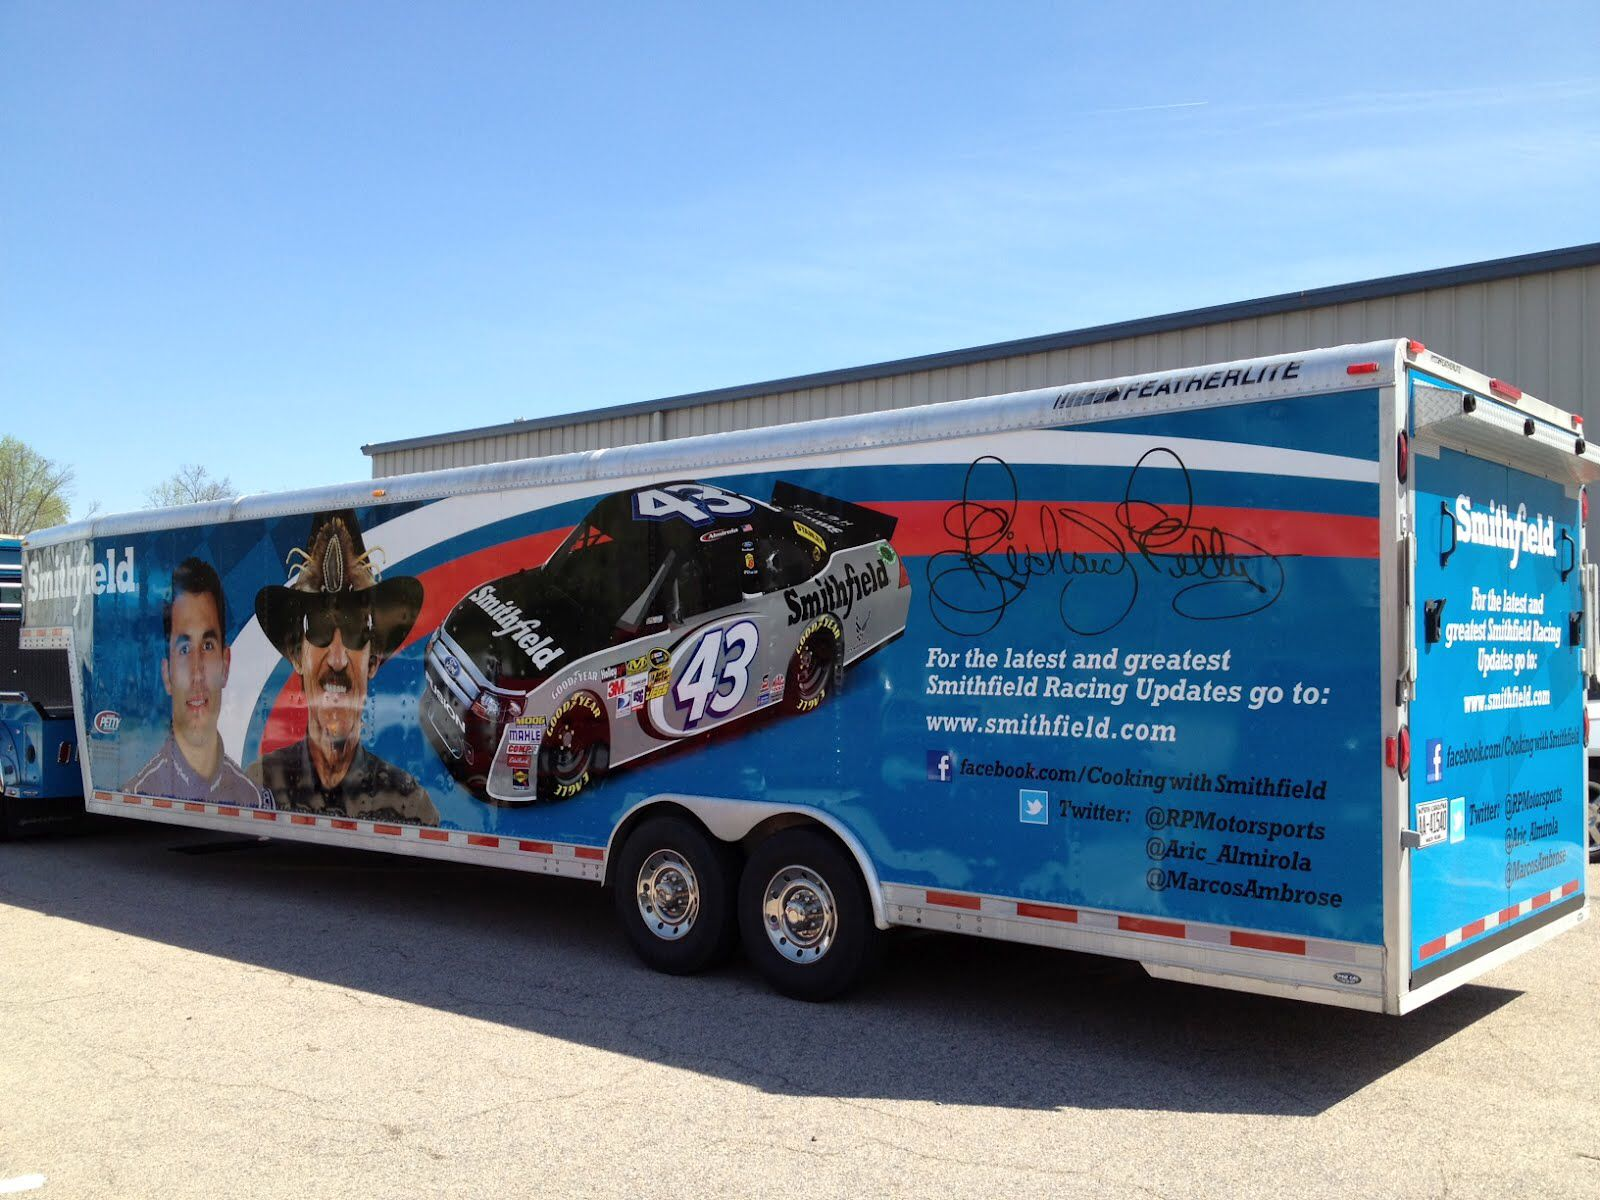 Richard Petty Motorsports Smithfield Show Car Hauler Racing - Show car trailer